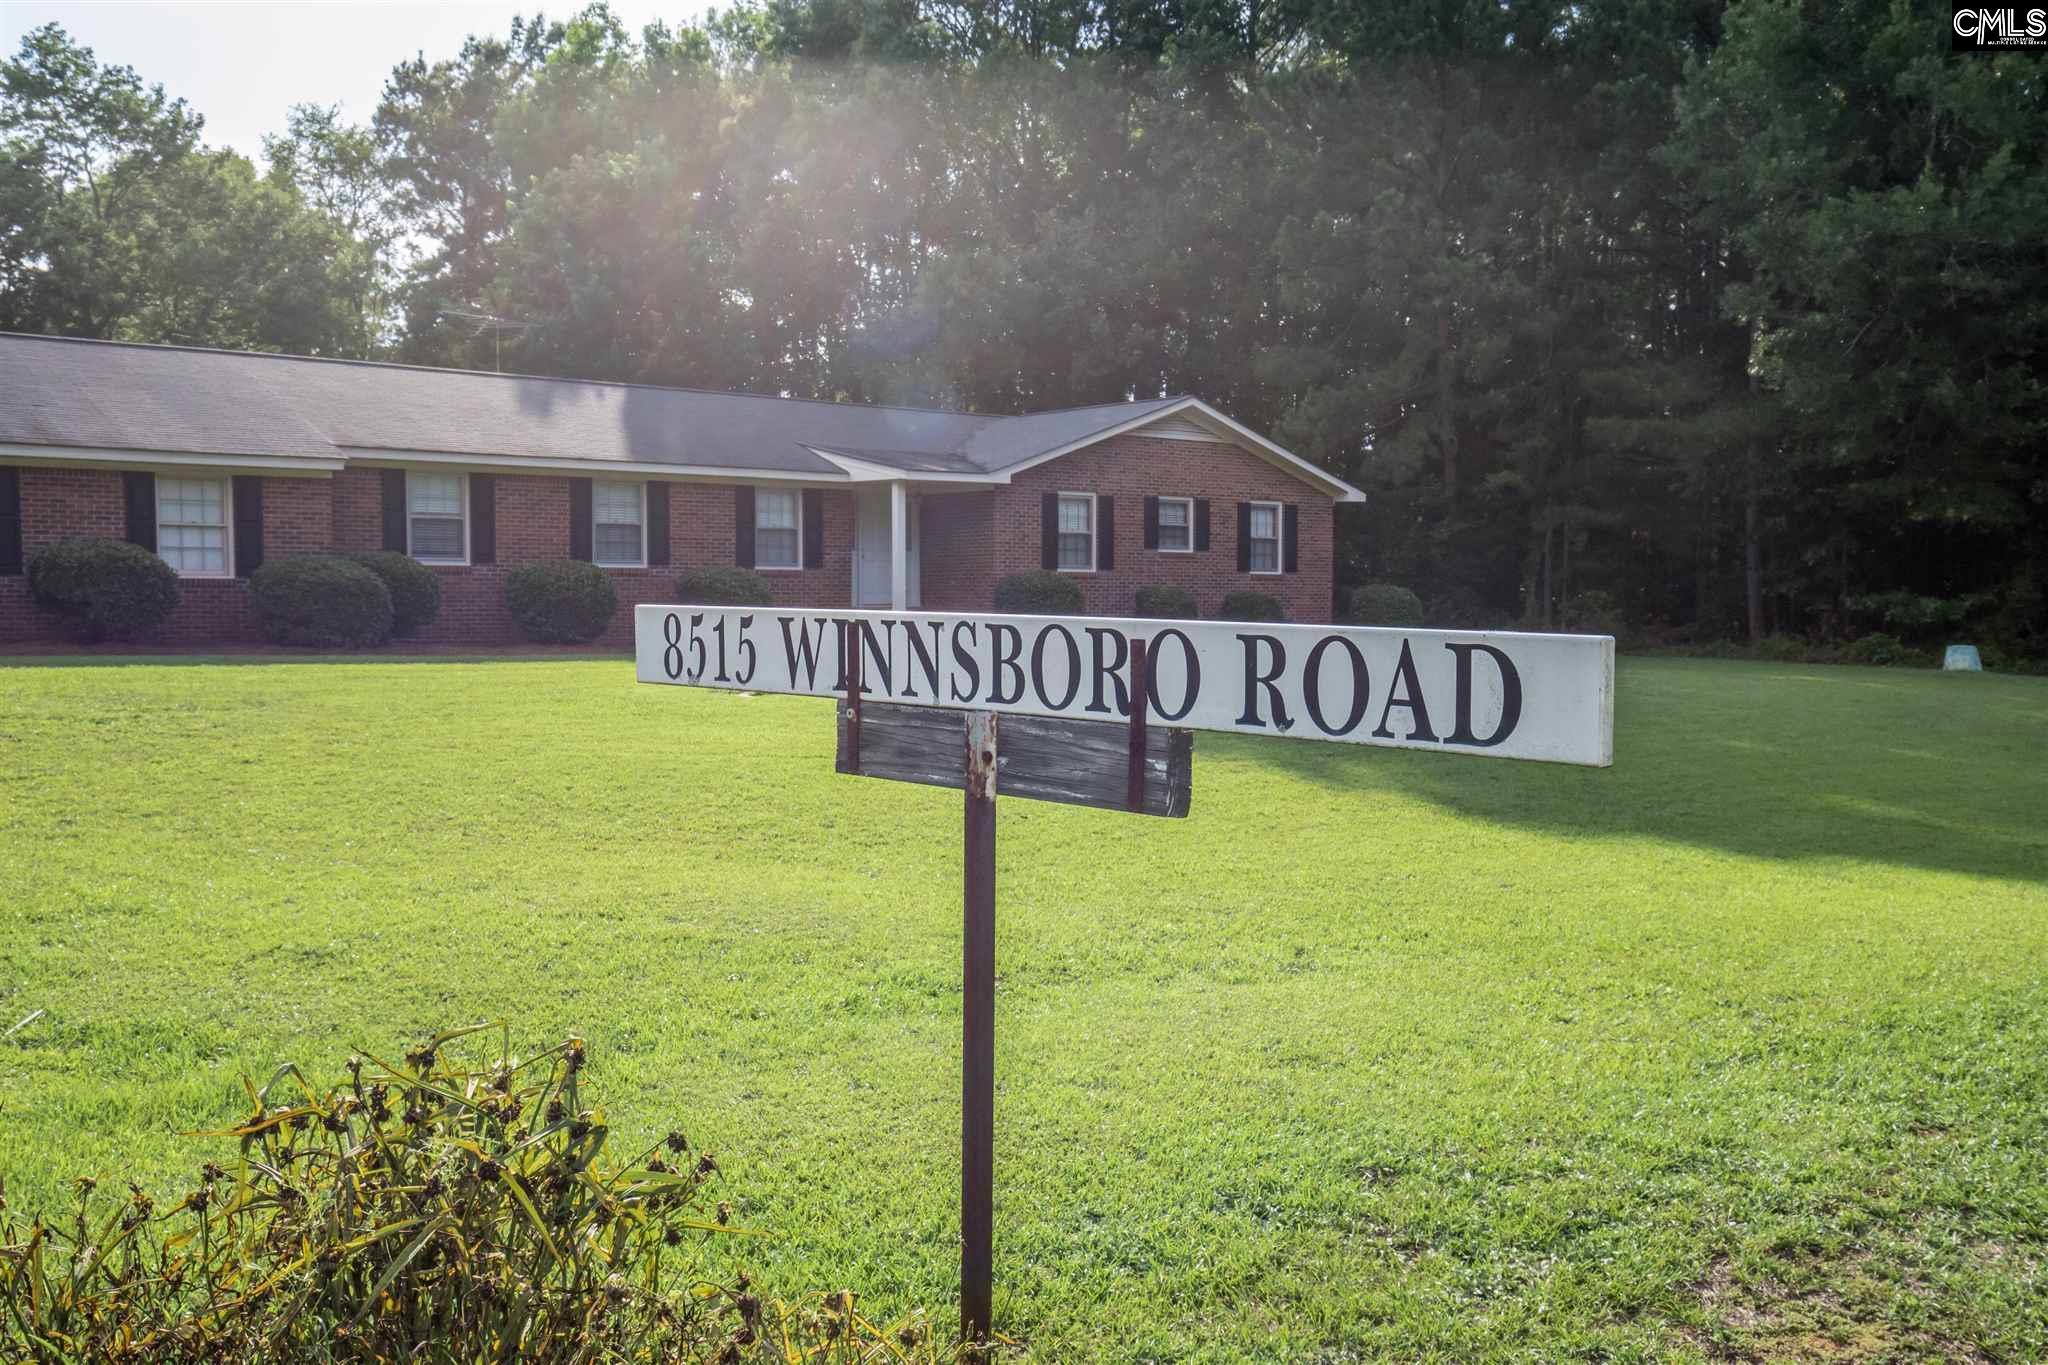 8515 Winnsboro Road Blythewood, SC 29016-9713